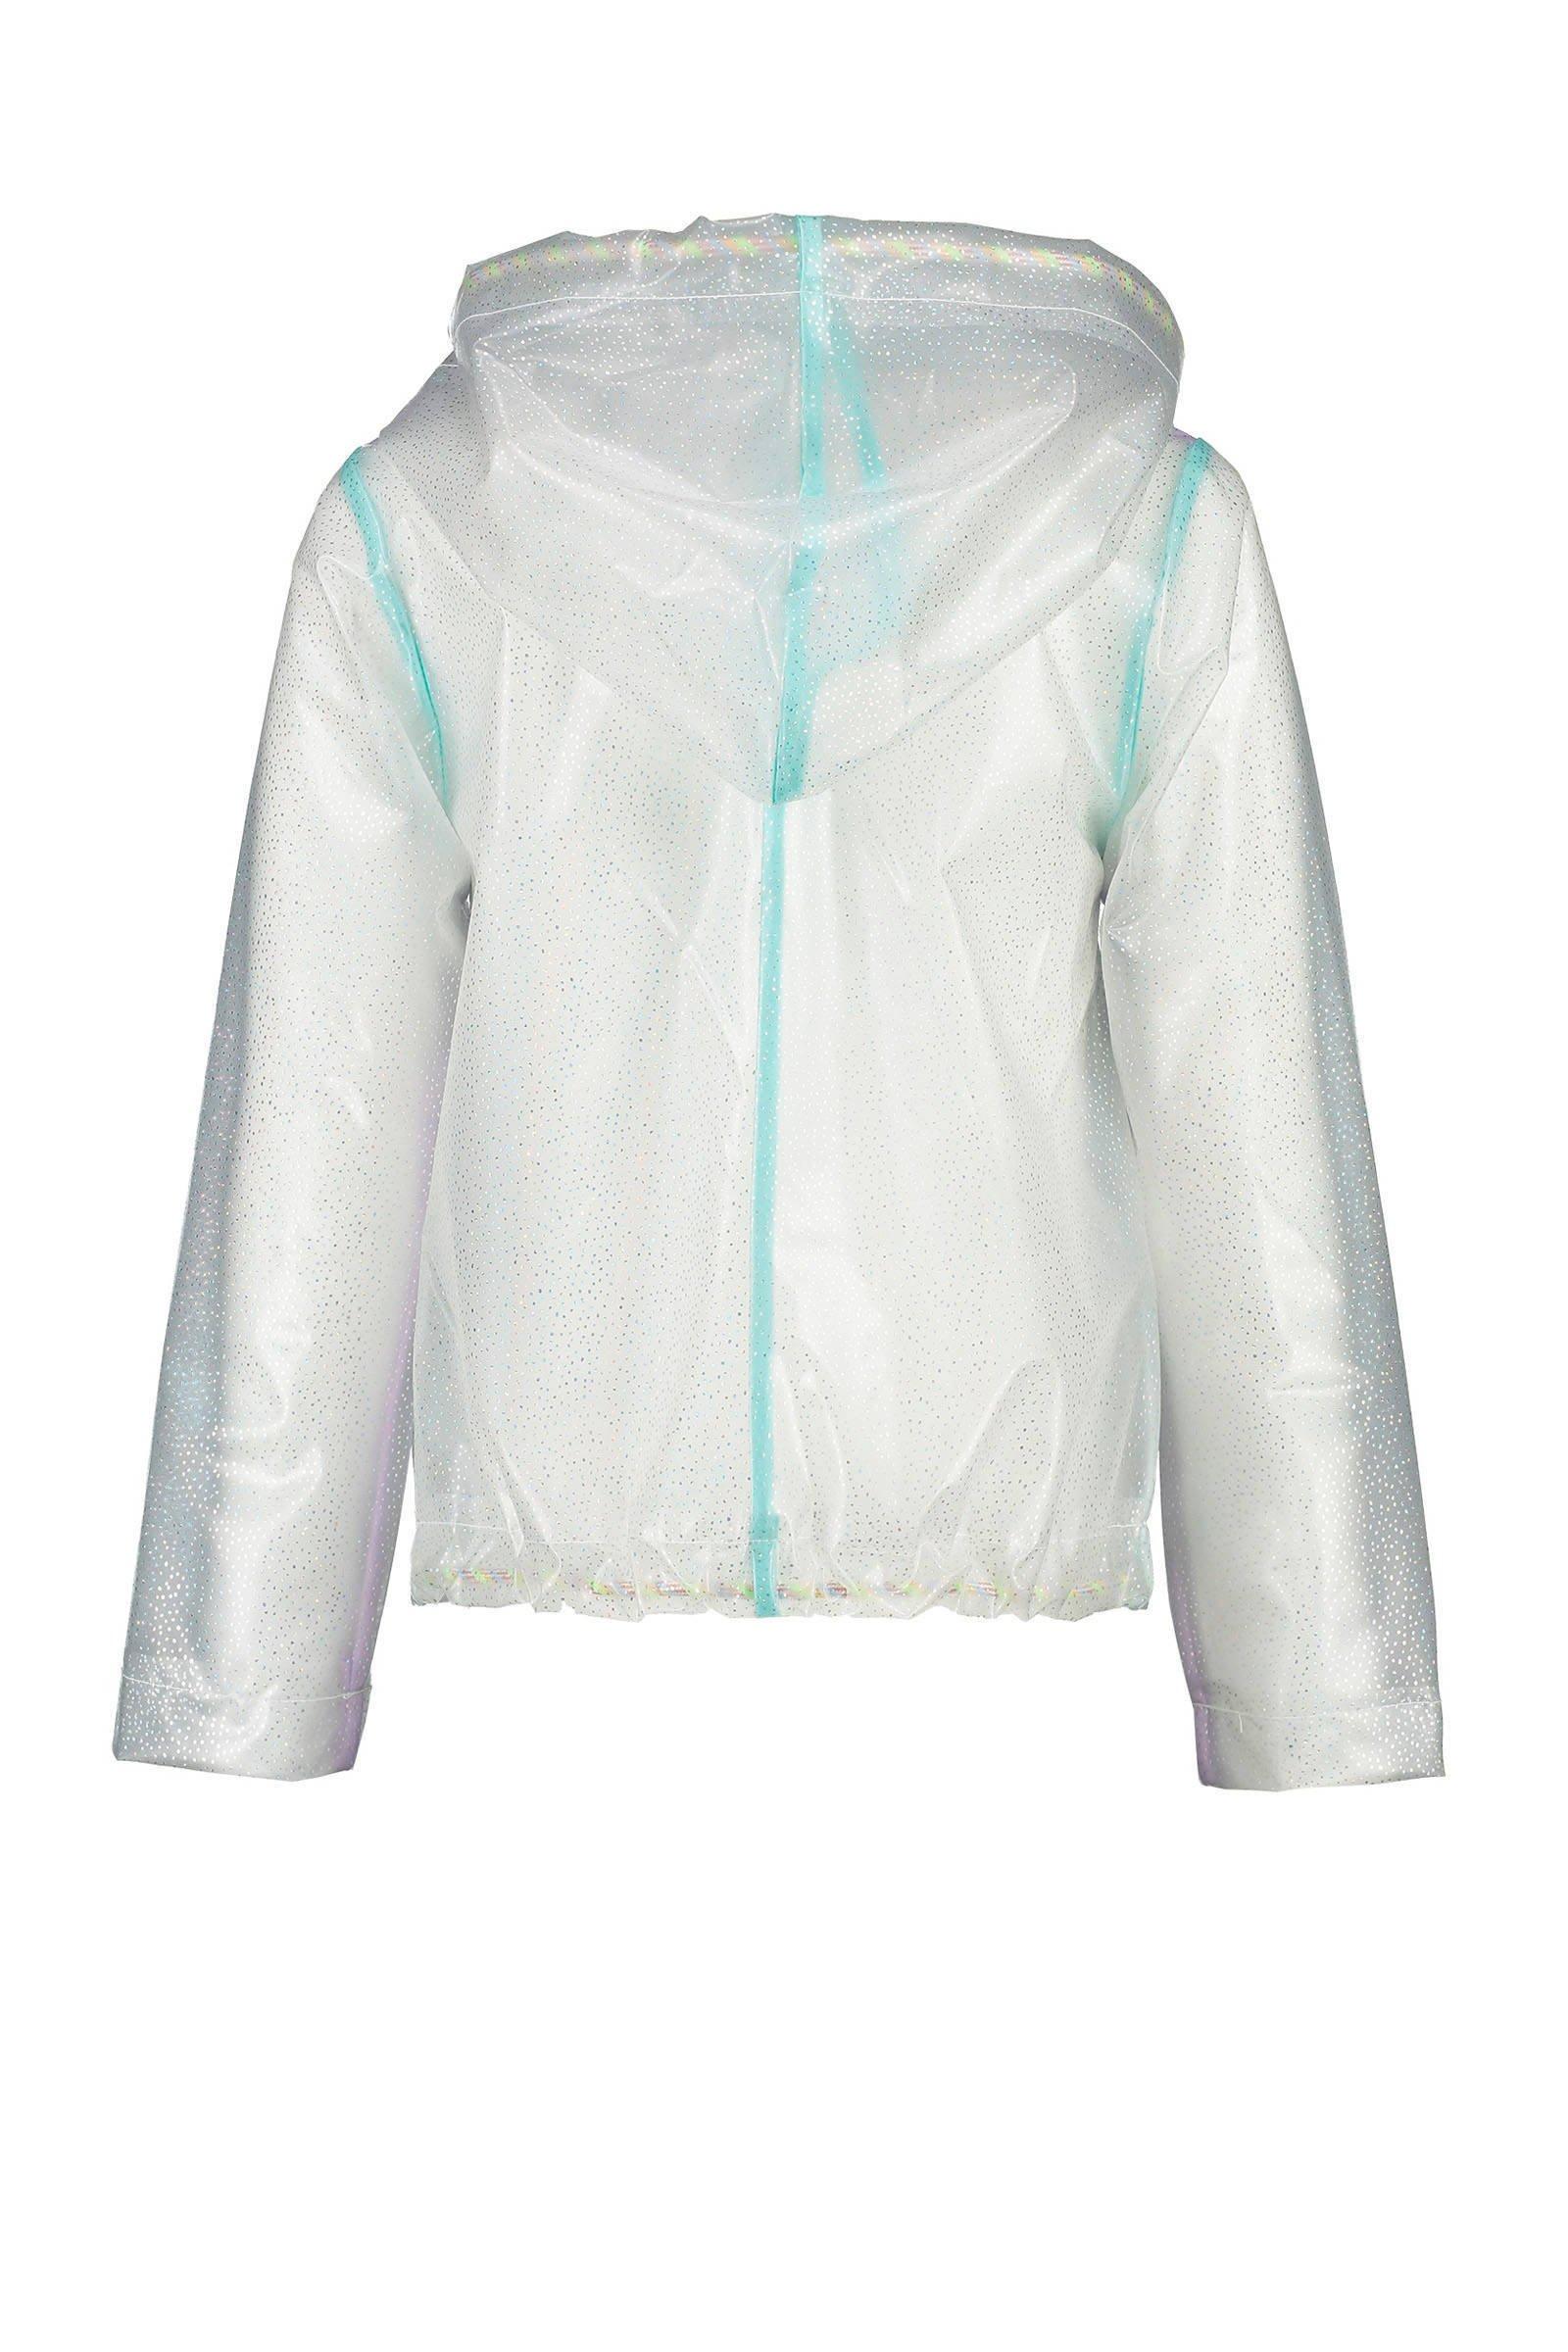 CKS KIDS semi transparante jas Hettie met all over print wit